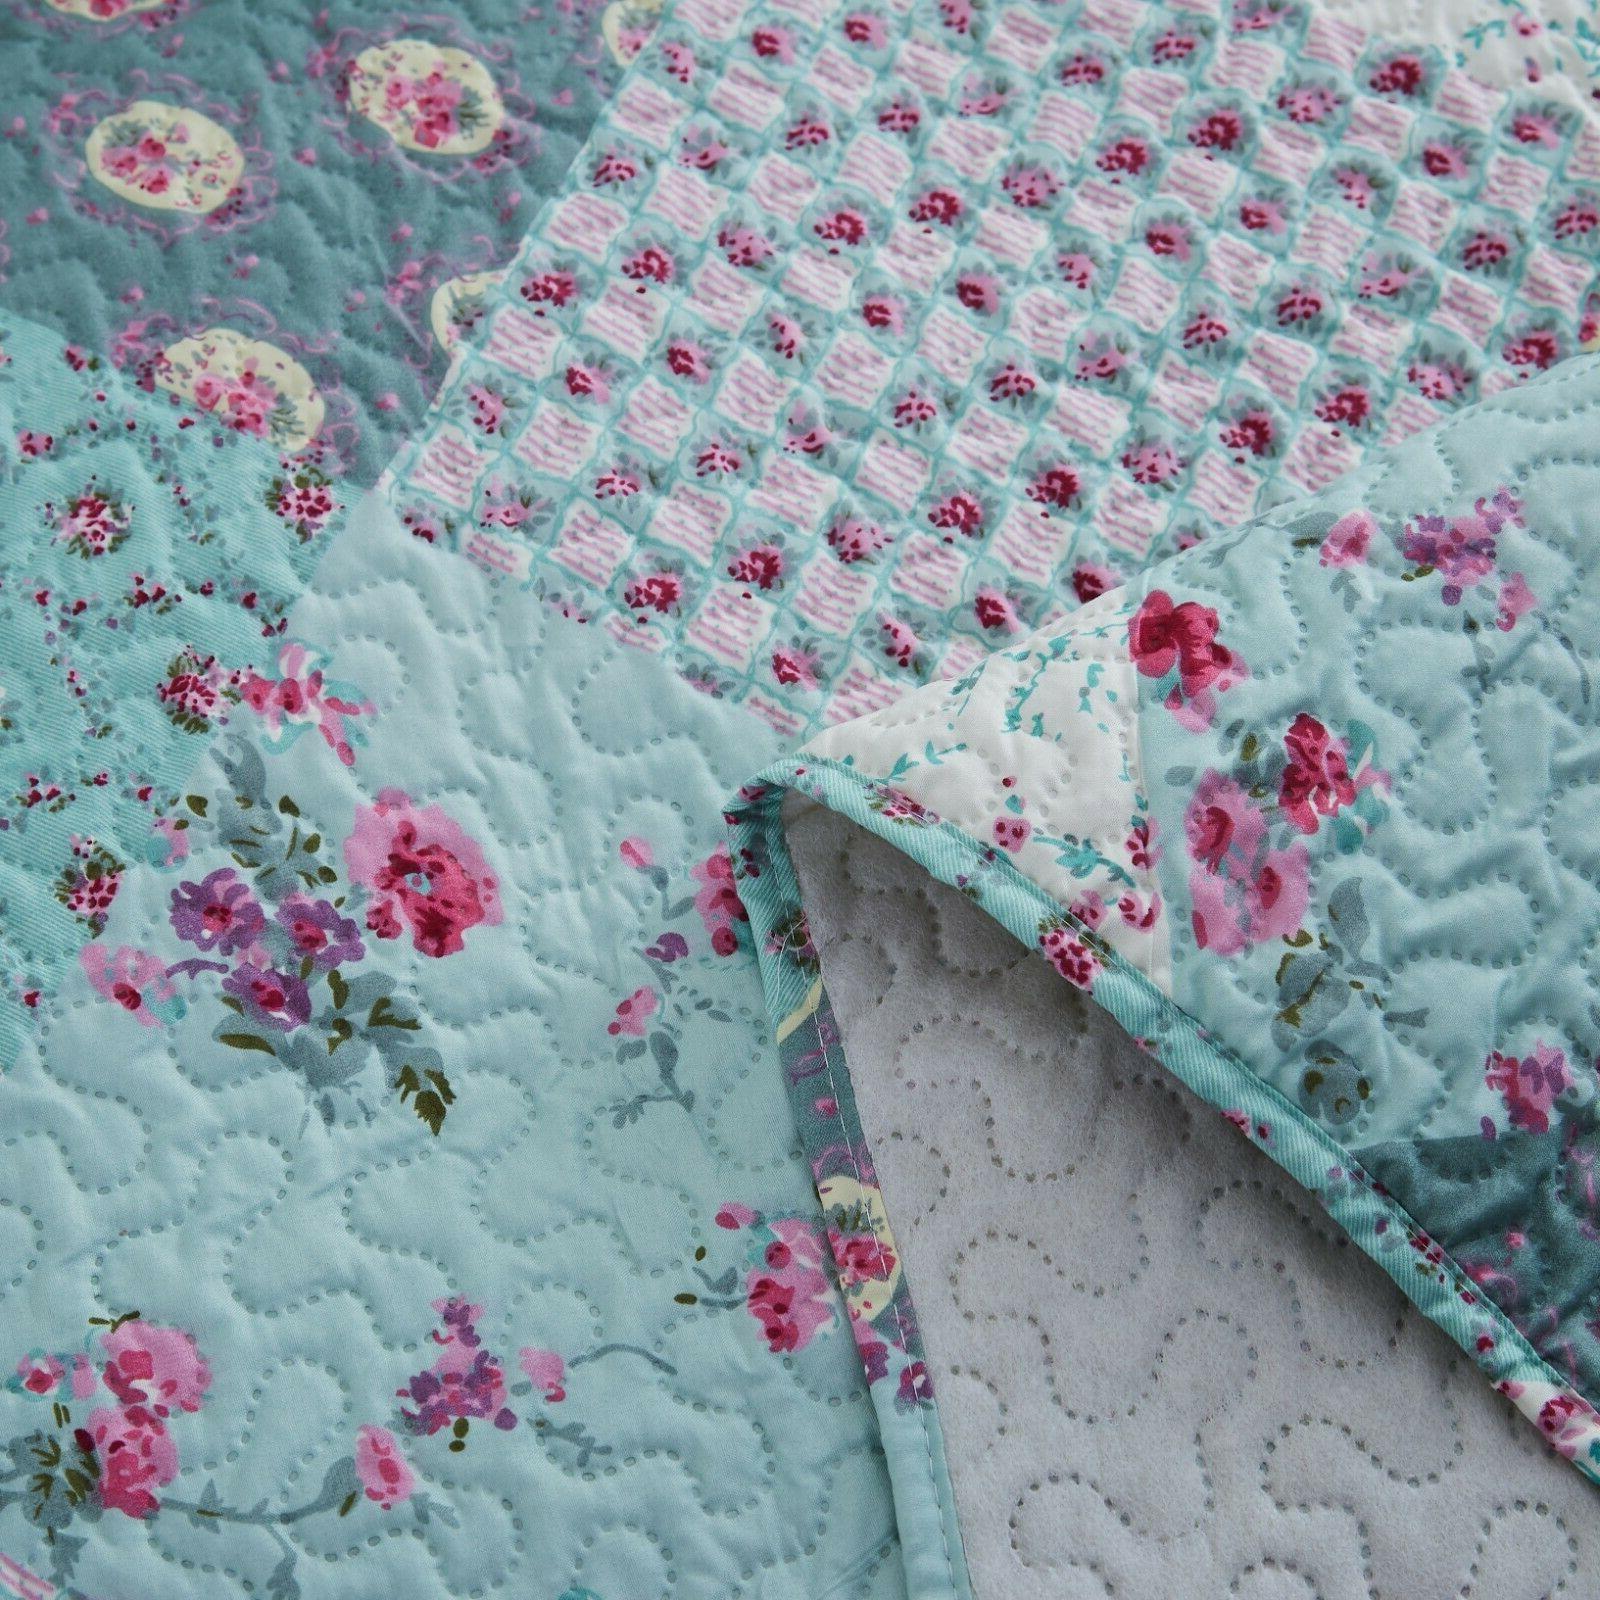 3 Piece Queen King Plaid Bedspread